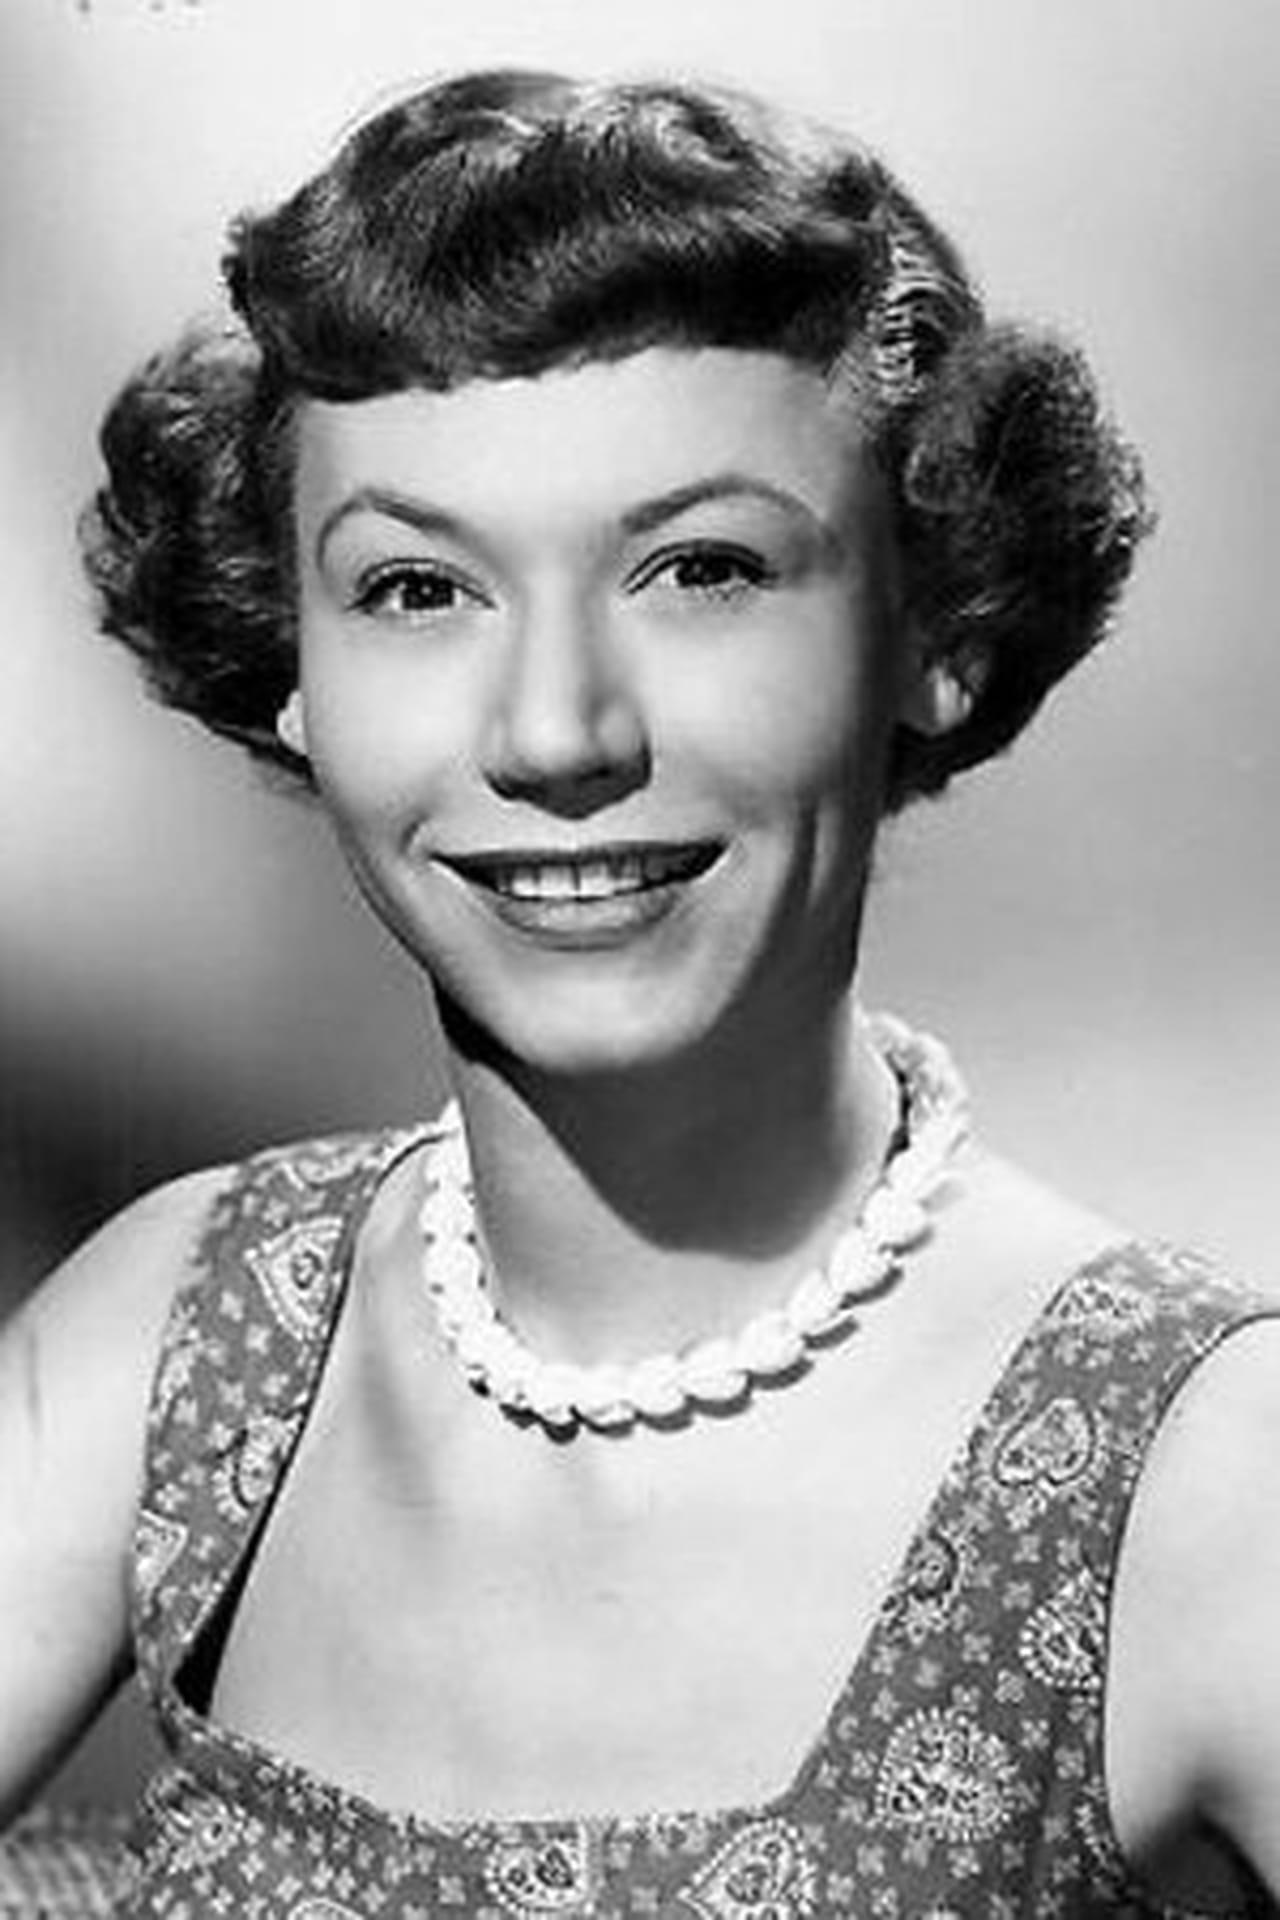 Beverly Wills